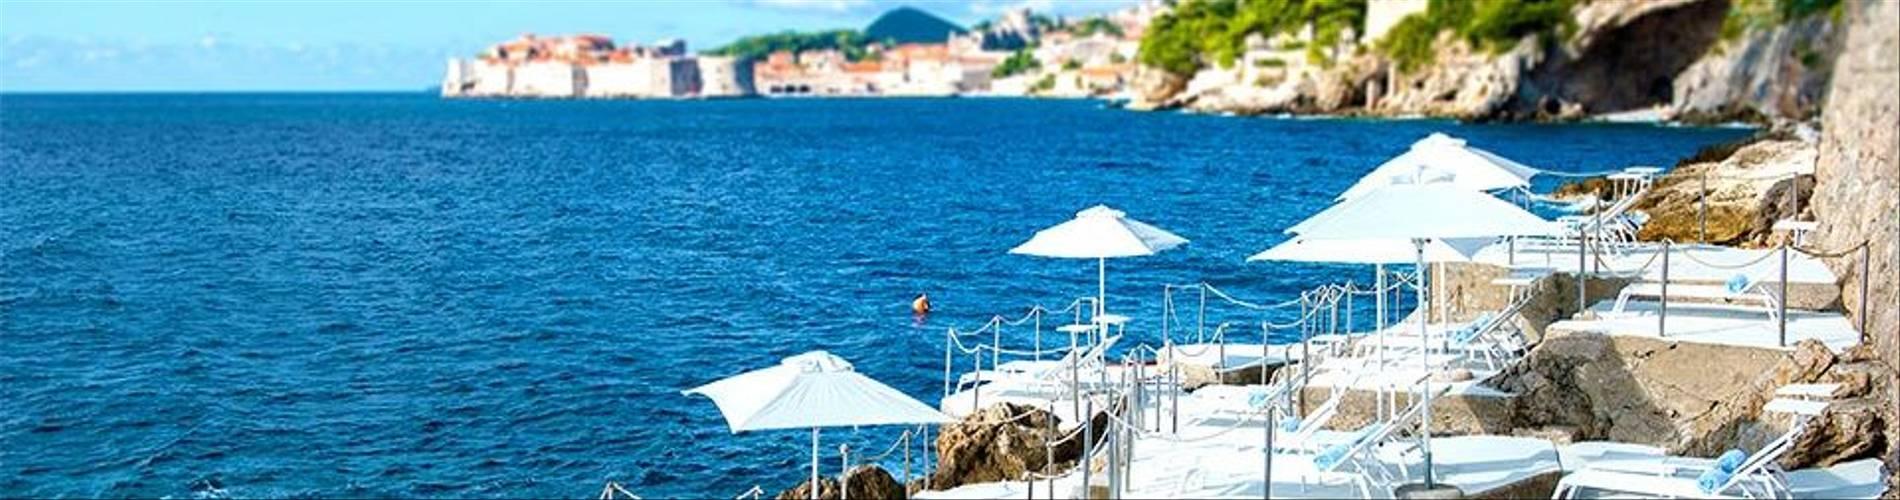 Beach-Villa-Dubrovnik-Completely-Croatia-2018-1.jpg